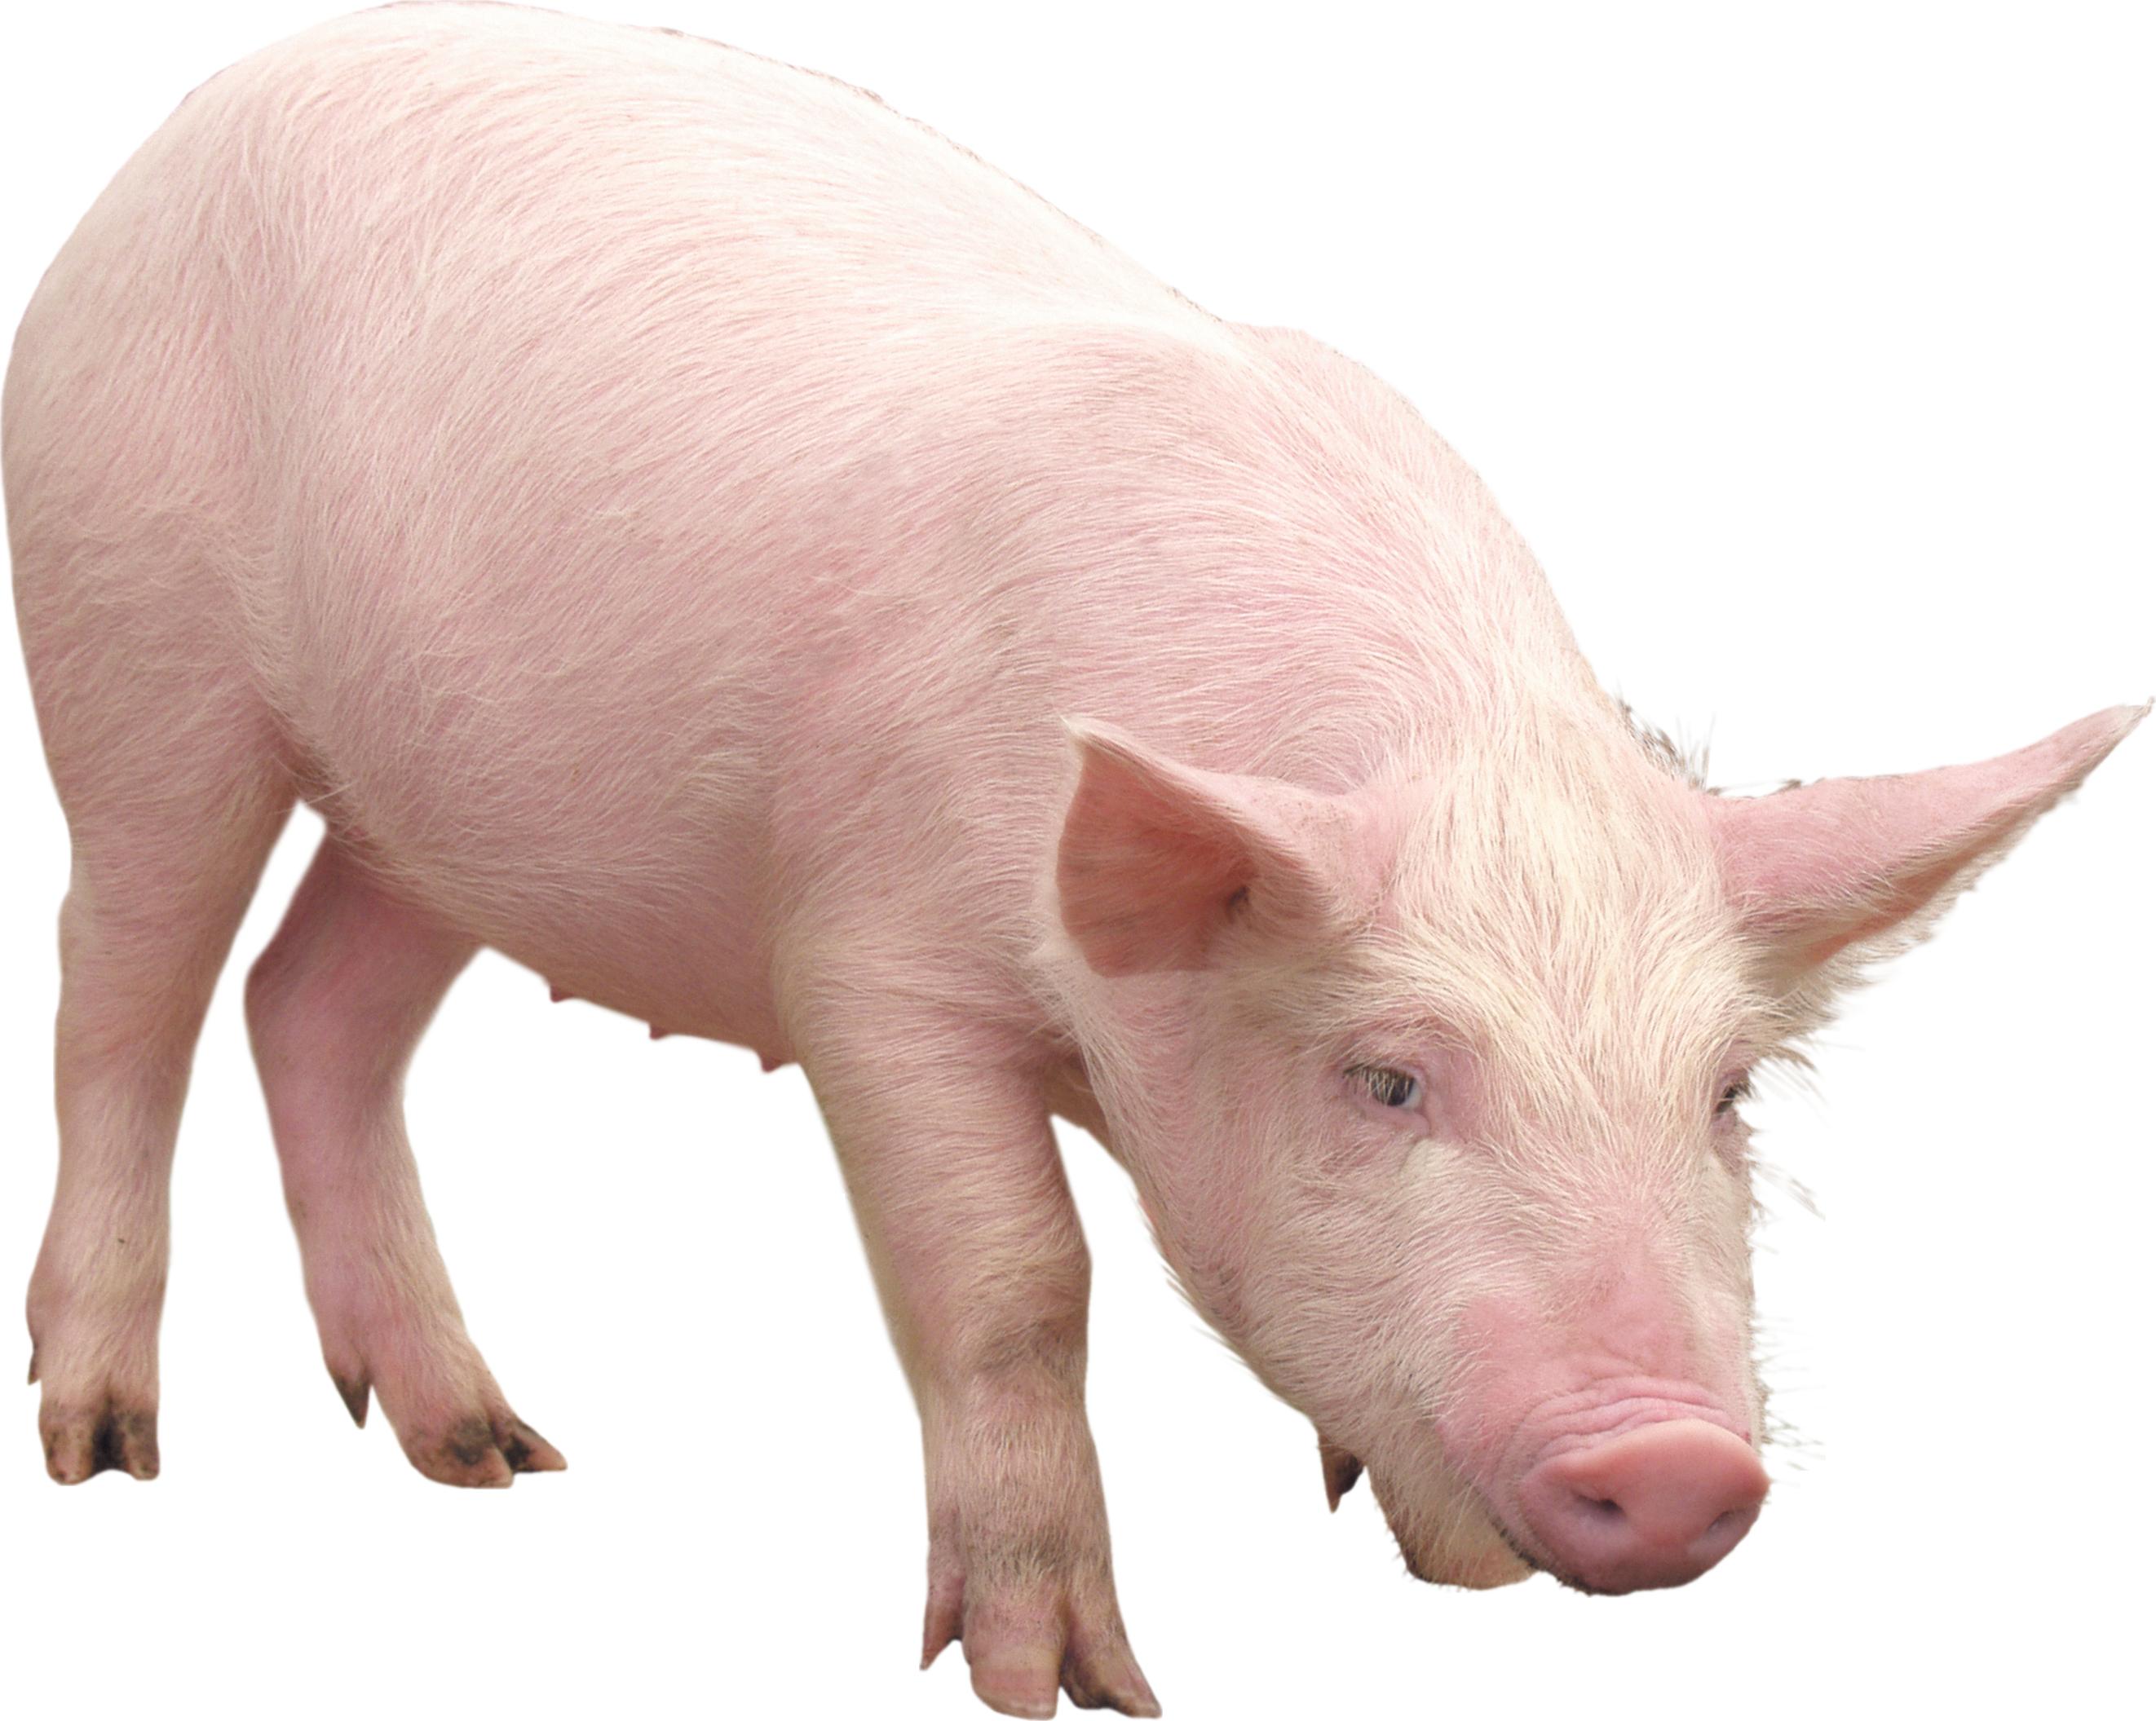 Pig clipart fetal pig. Png transparent free images